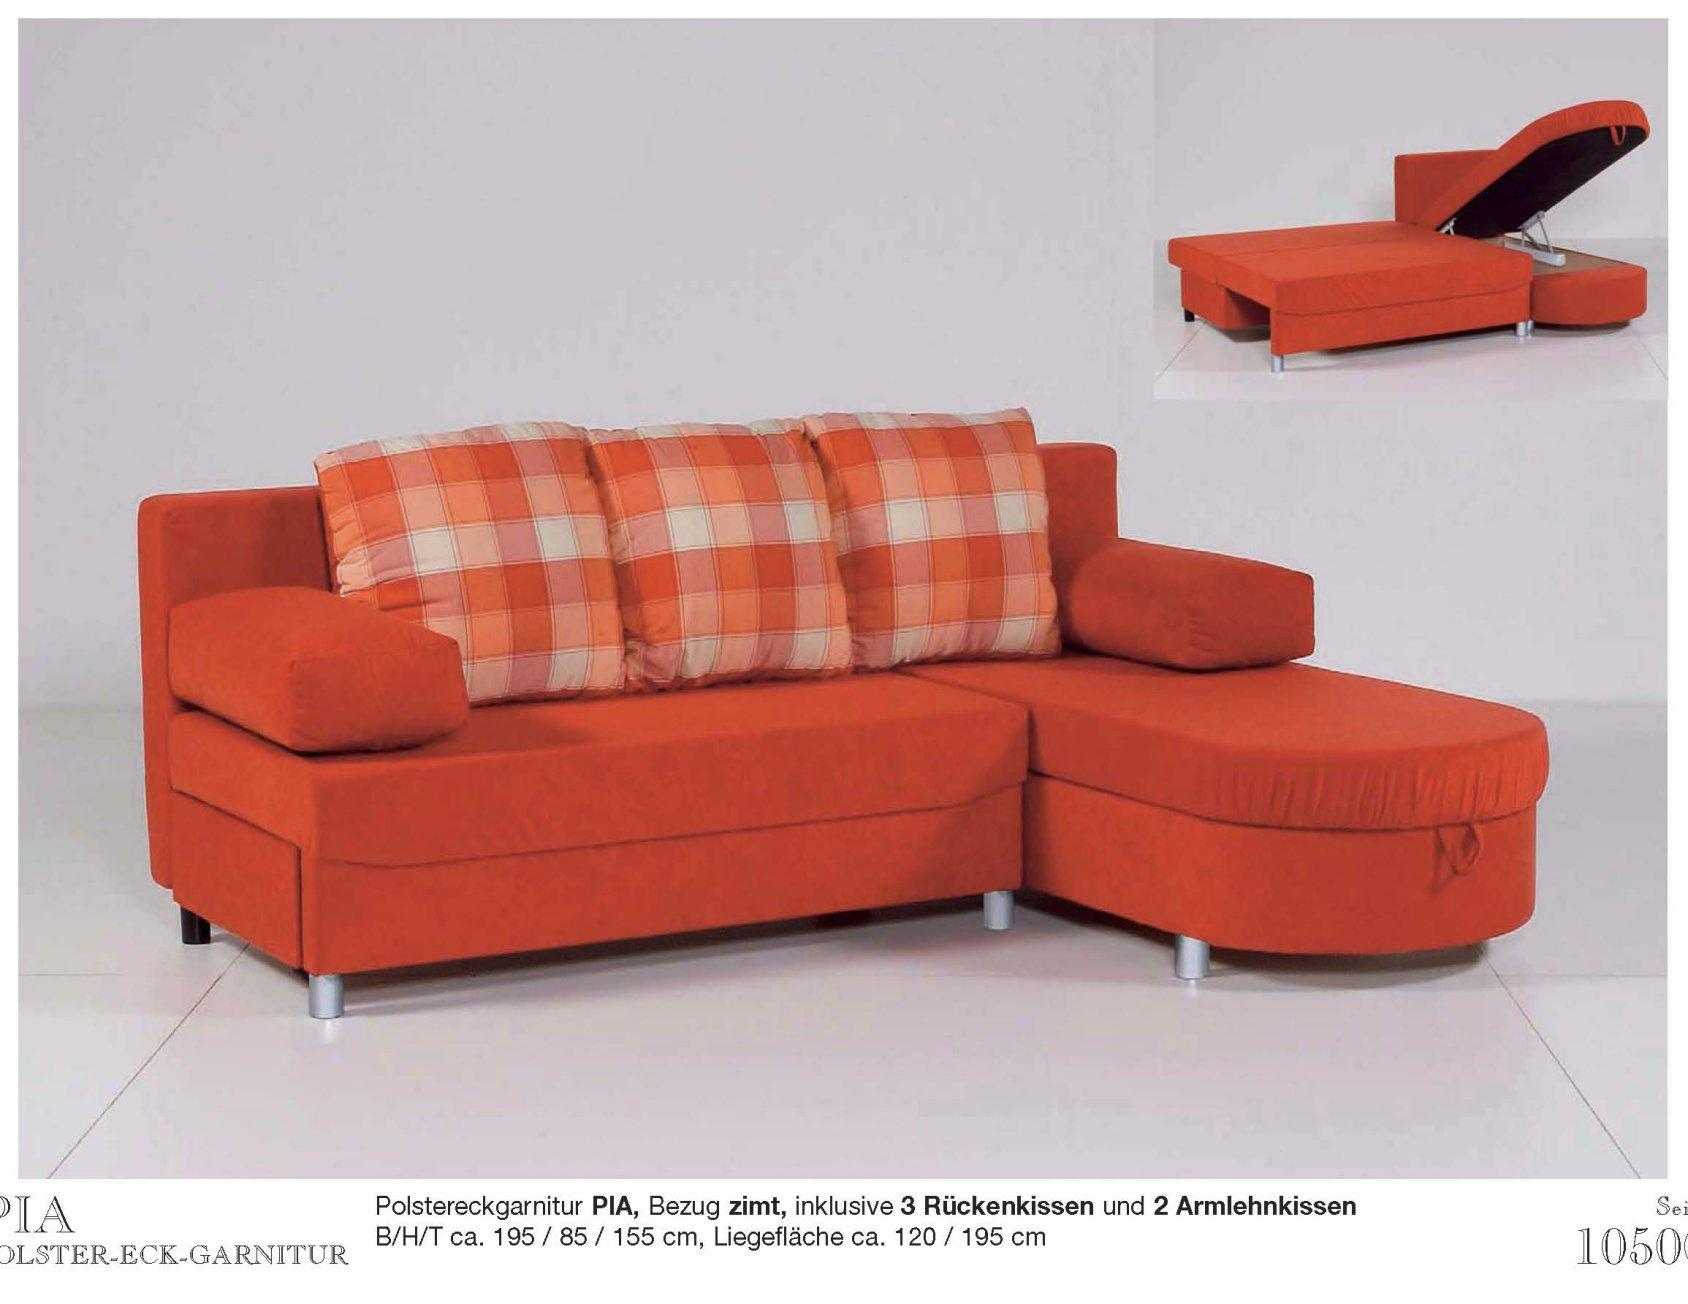 Sleeper Sofa Clearance